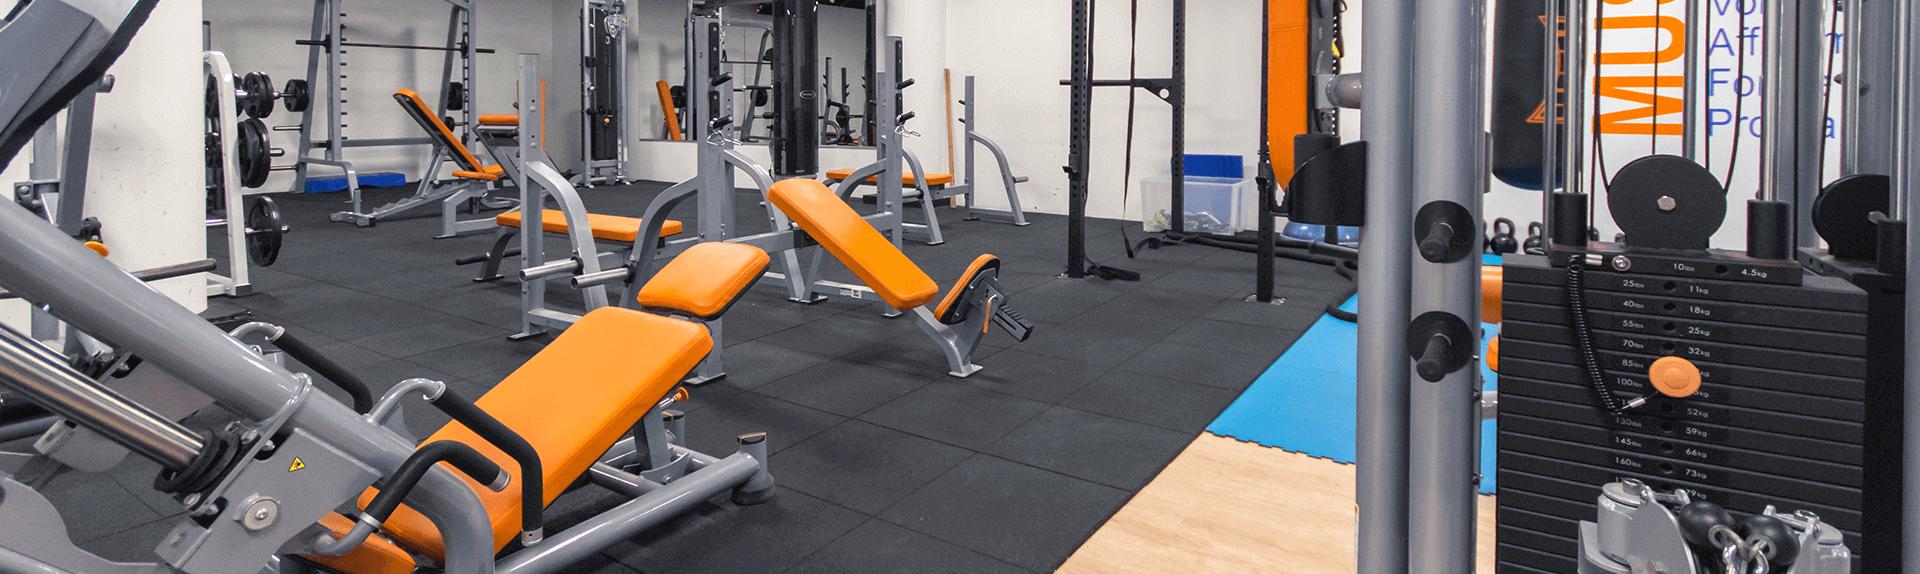 Salle De Sport Et Fitness À Valence - Guilherand-Granges - L ... concernant Piscine Guilherand Granges